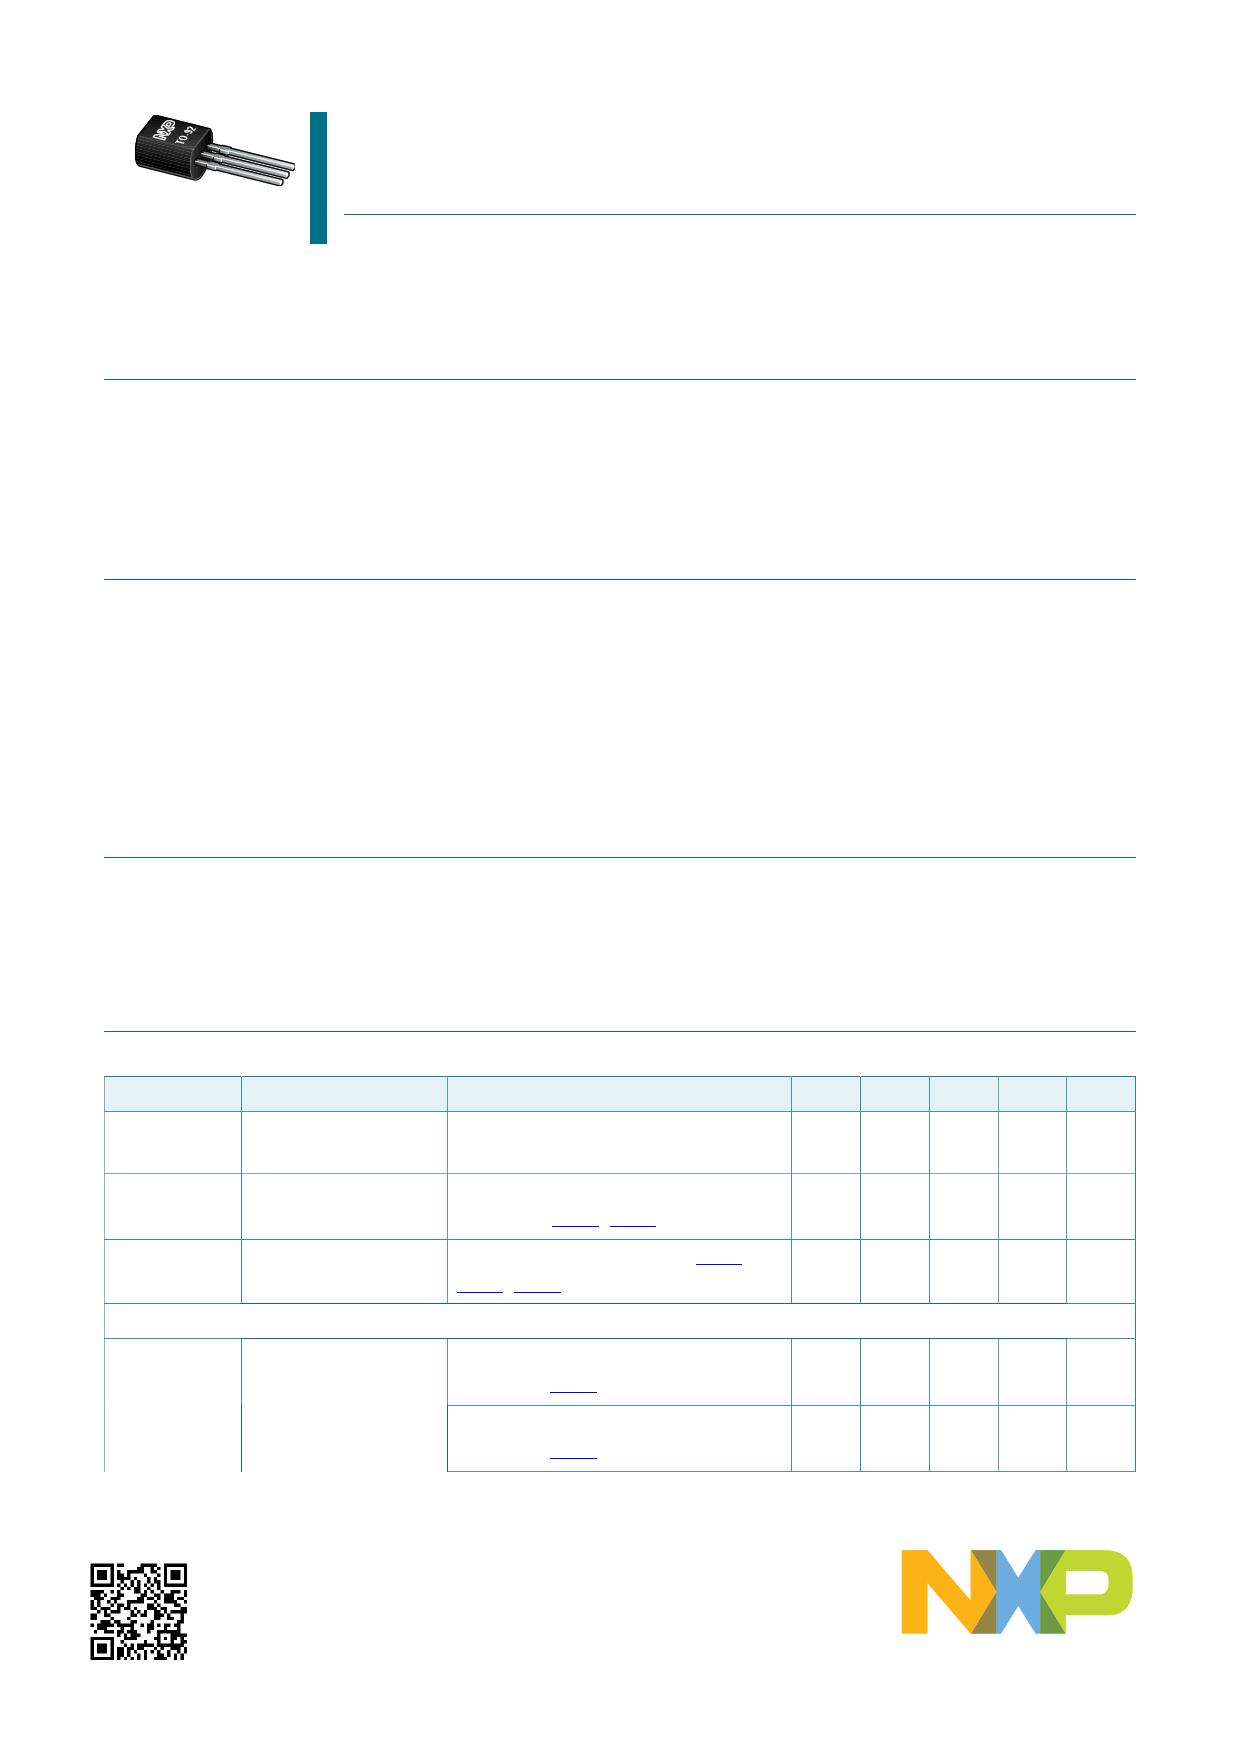 BT132-600D دیتاشیت PDF